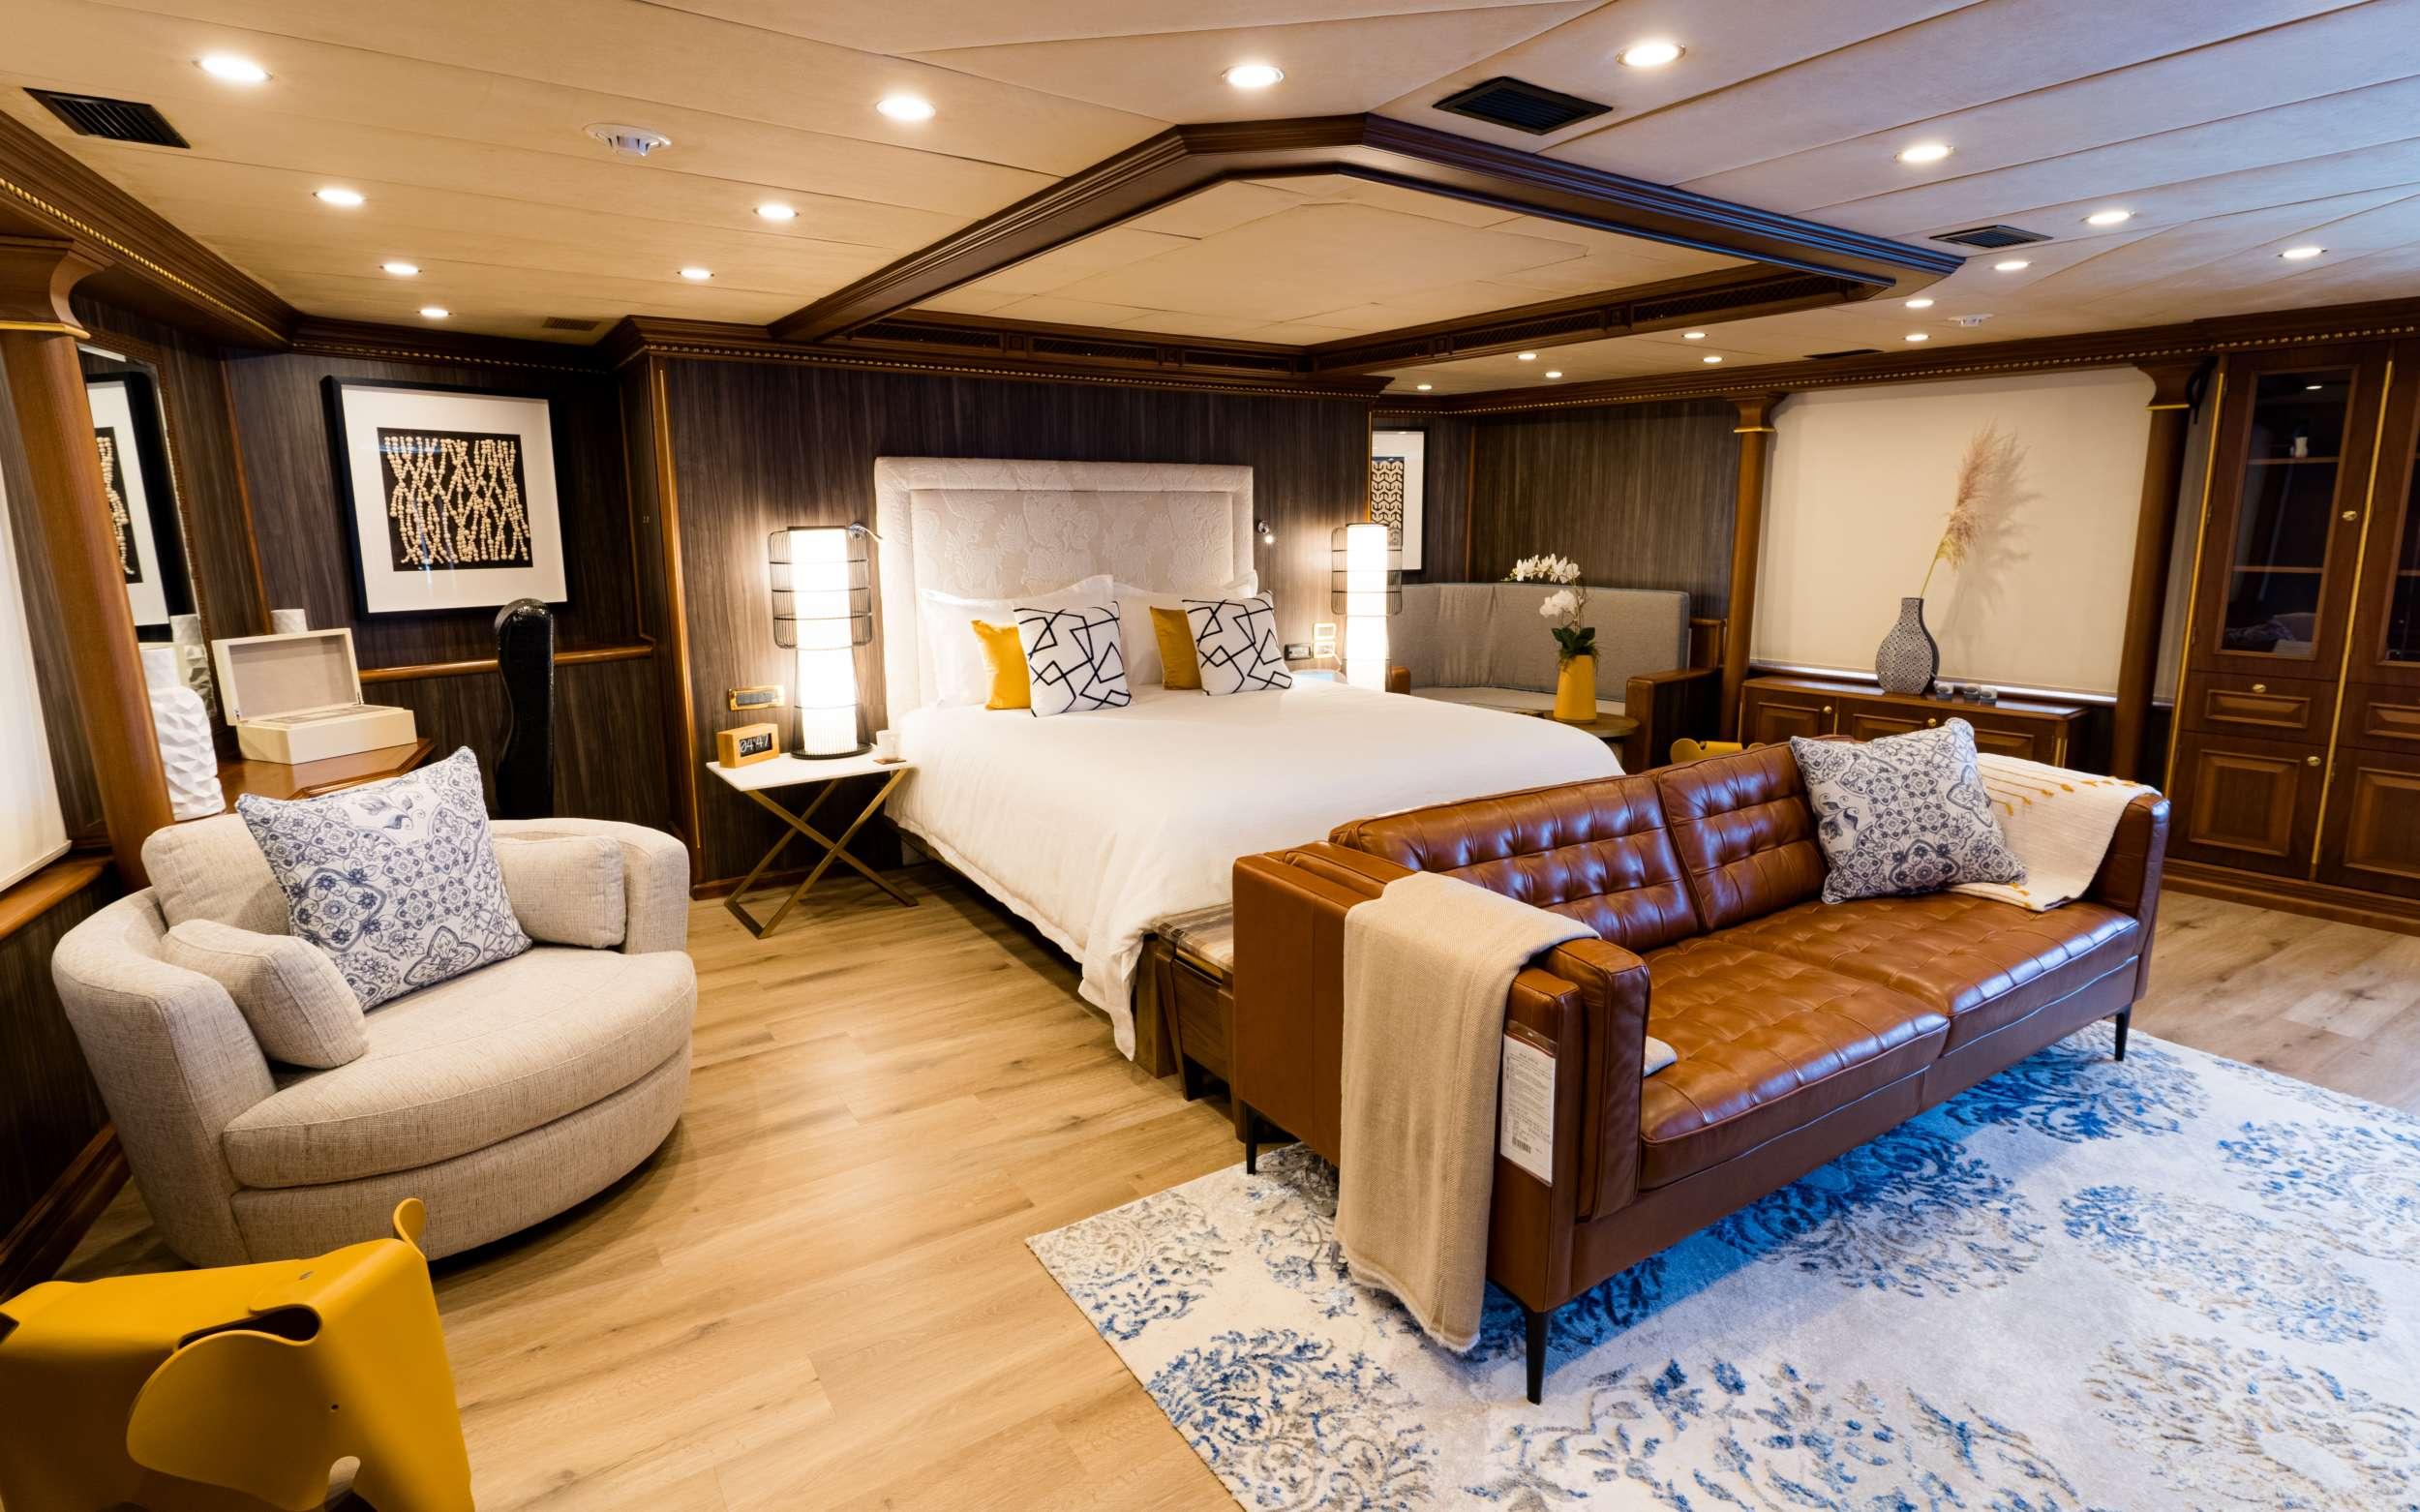 Image of iRama yacht #6